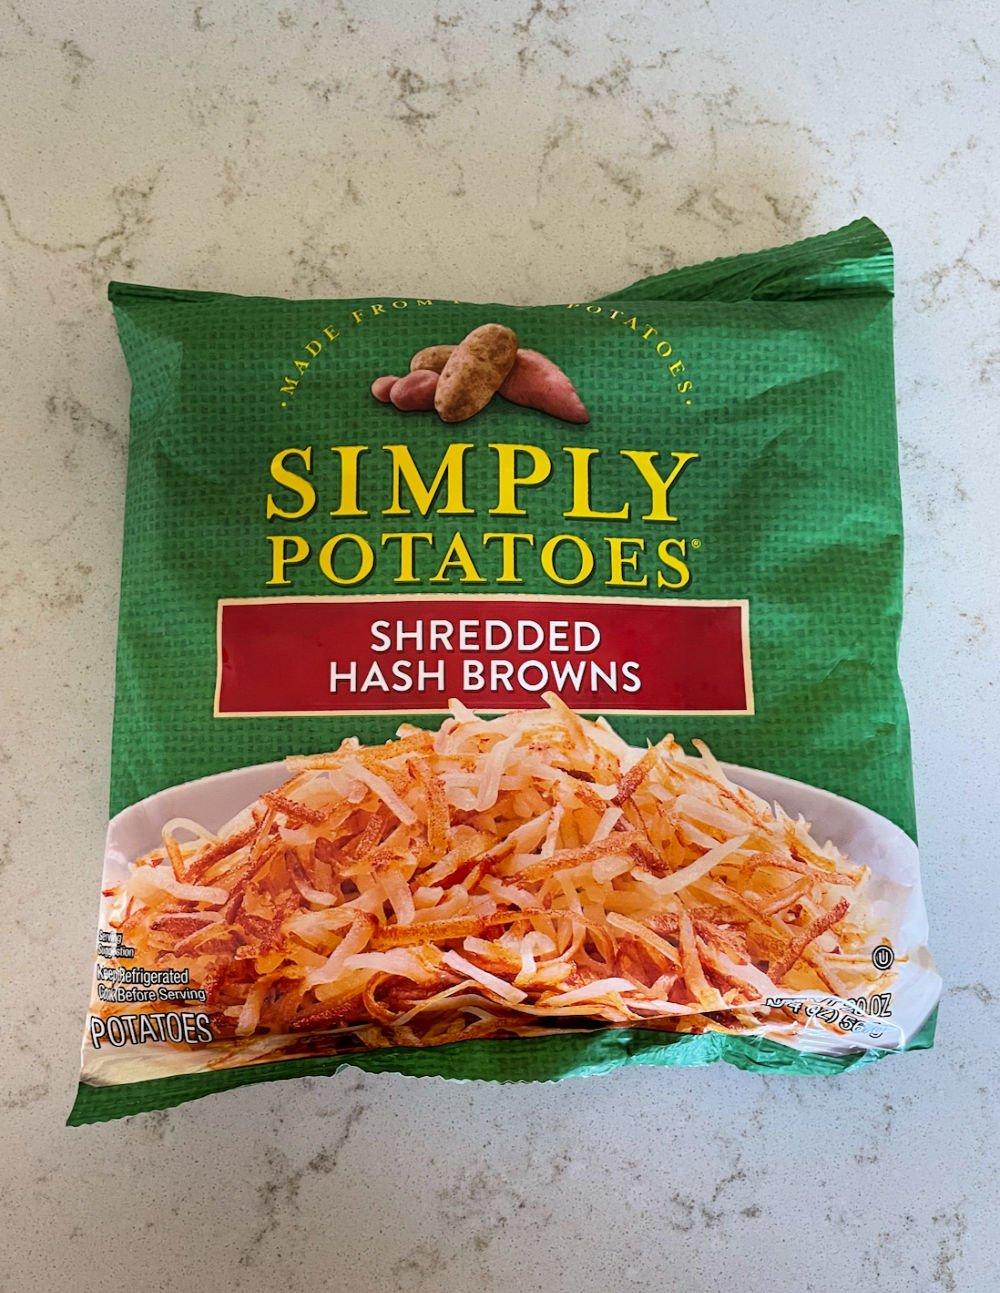 1 bag of Simple Potatoes Shredded Hash Browns